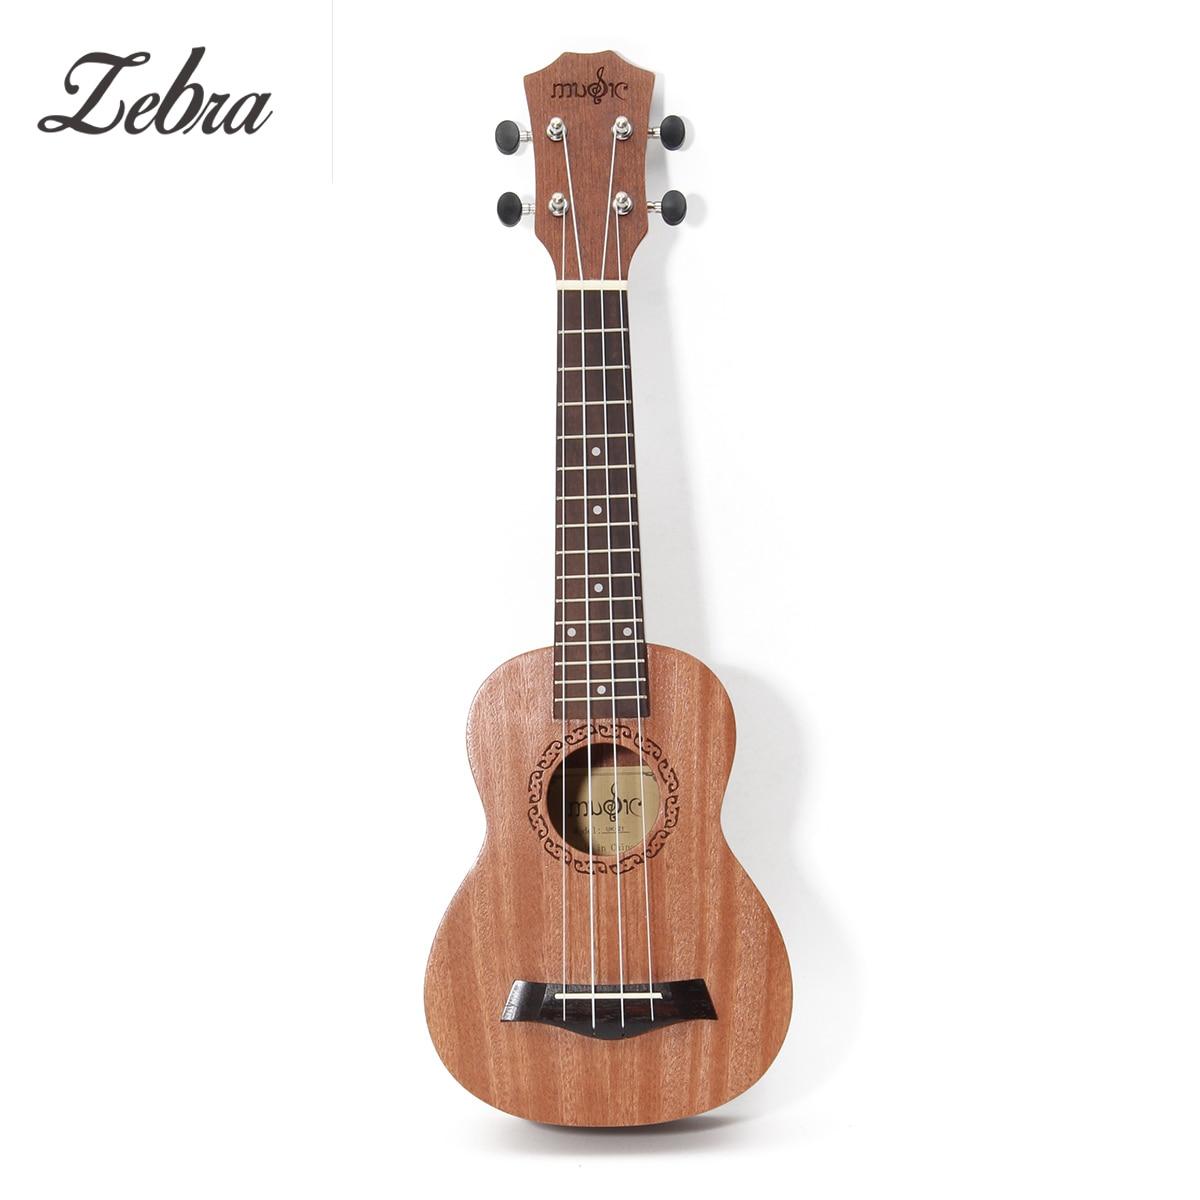 21 inčni 15 fretova mahagoni sopran ukulele gitara sapele ružino - Glazbeni instrumenti - Foto 1